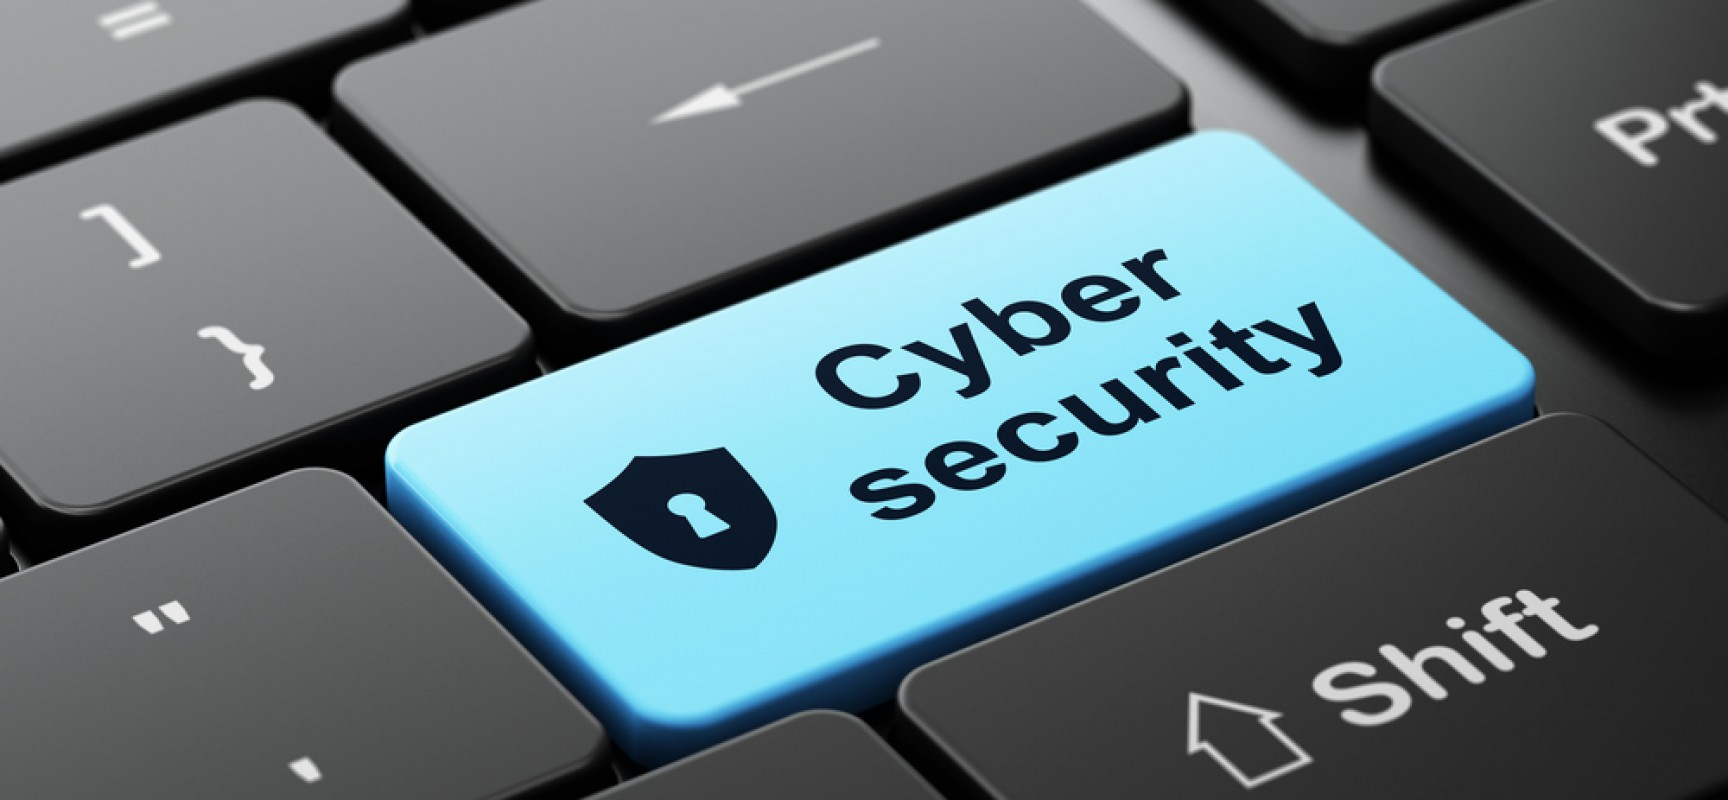 Top 15 empresas de seguridad cibernética de Londres